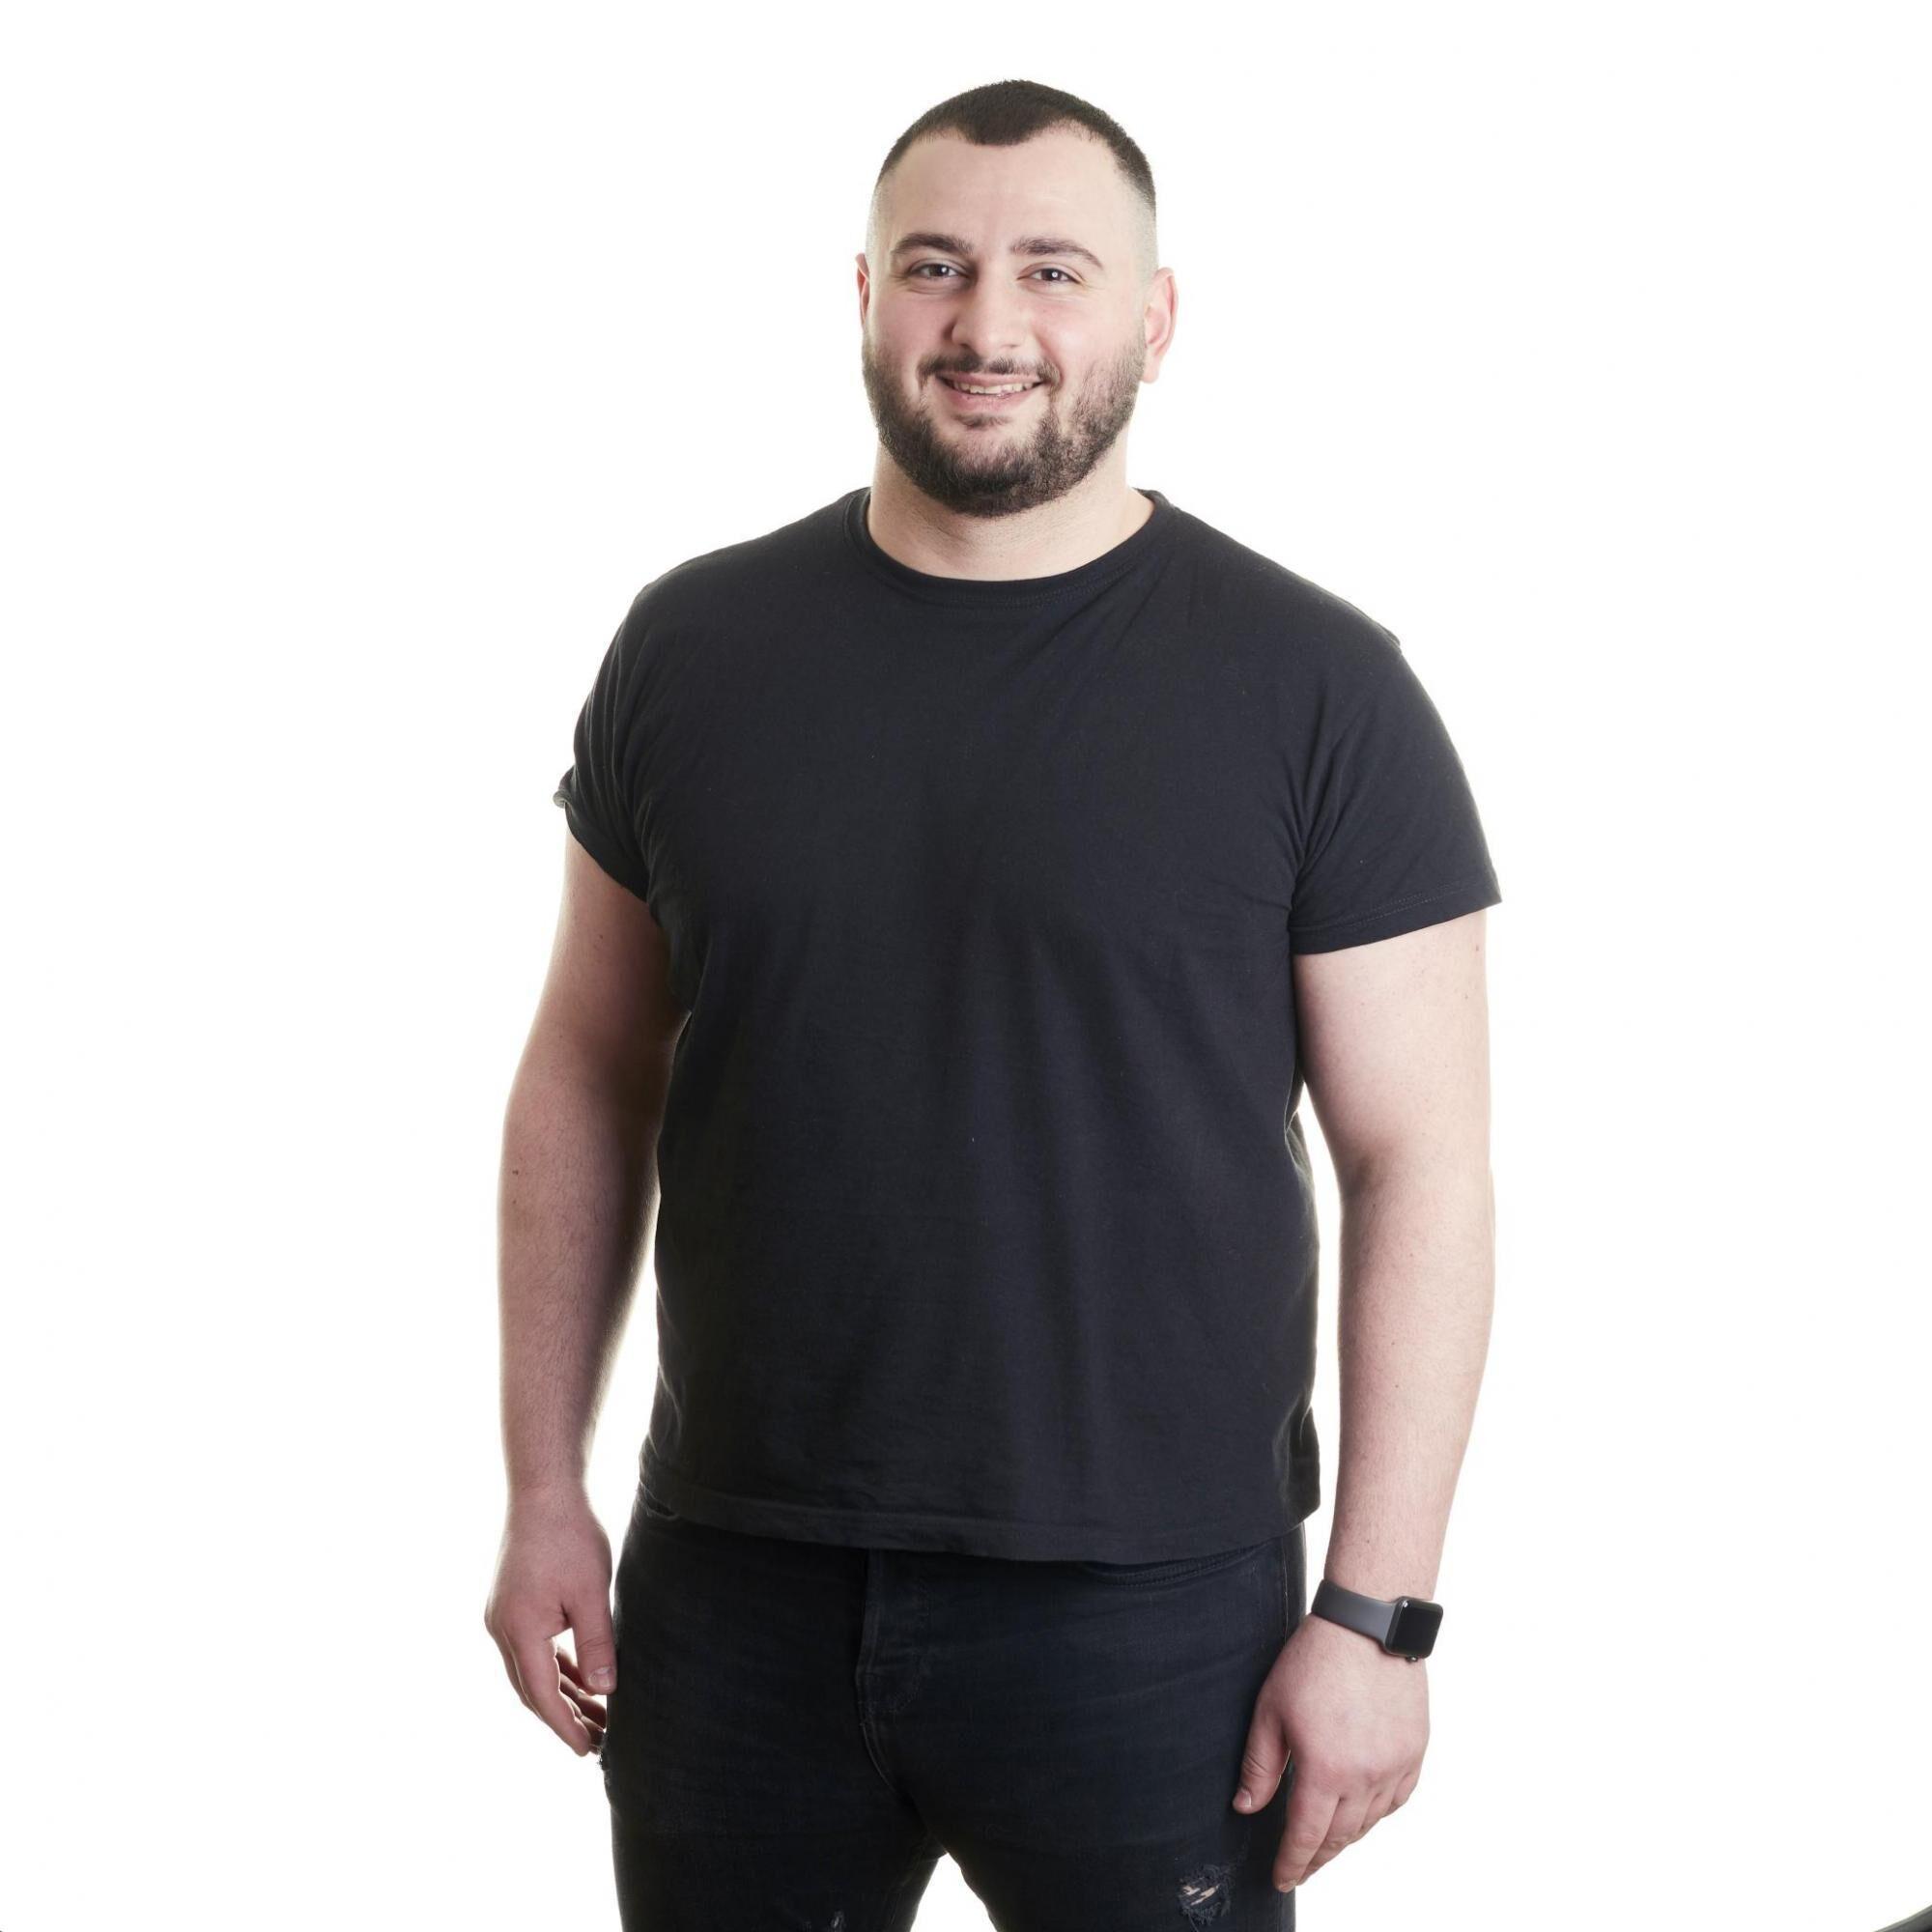 Poghosyan